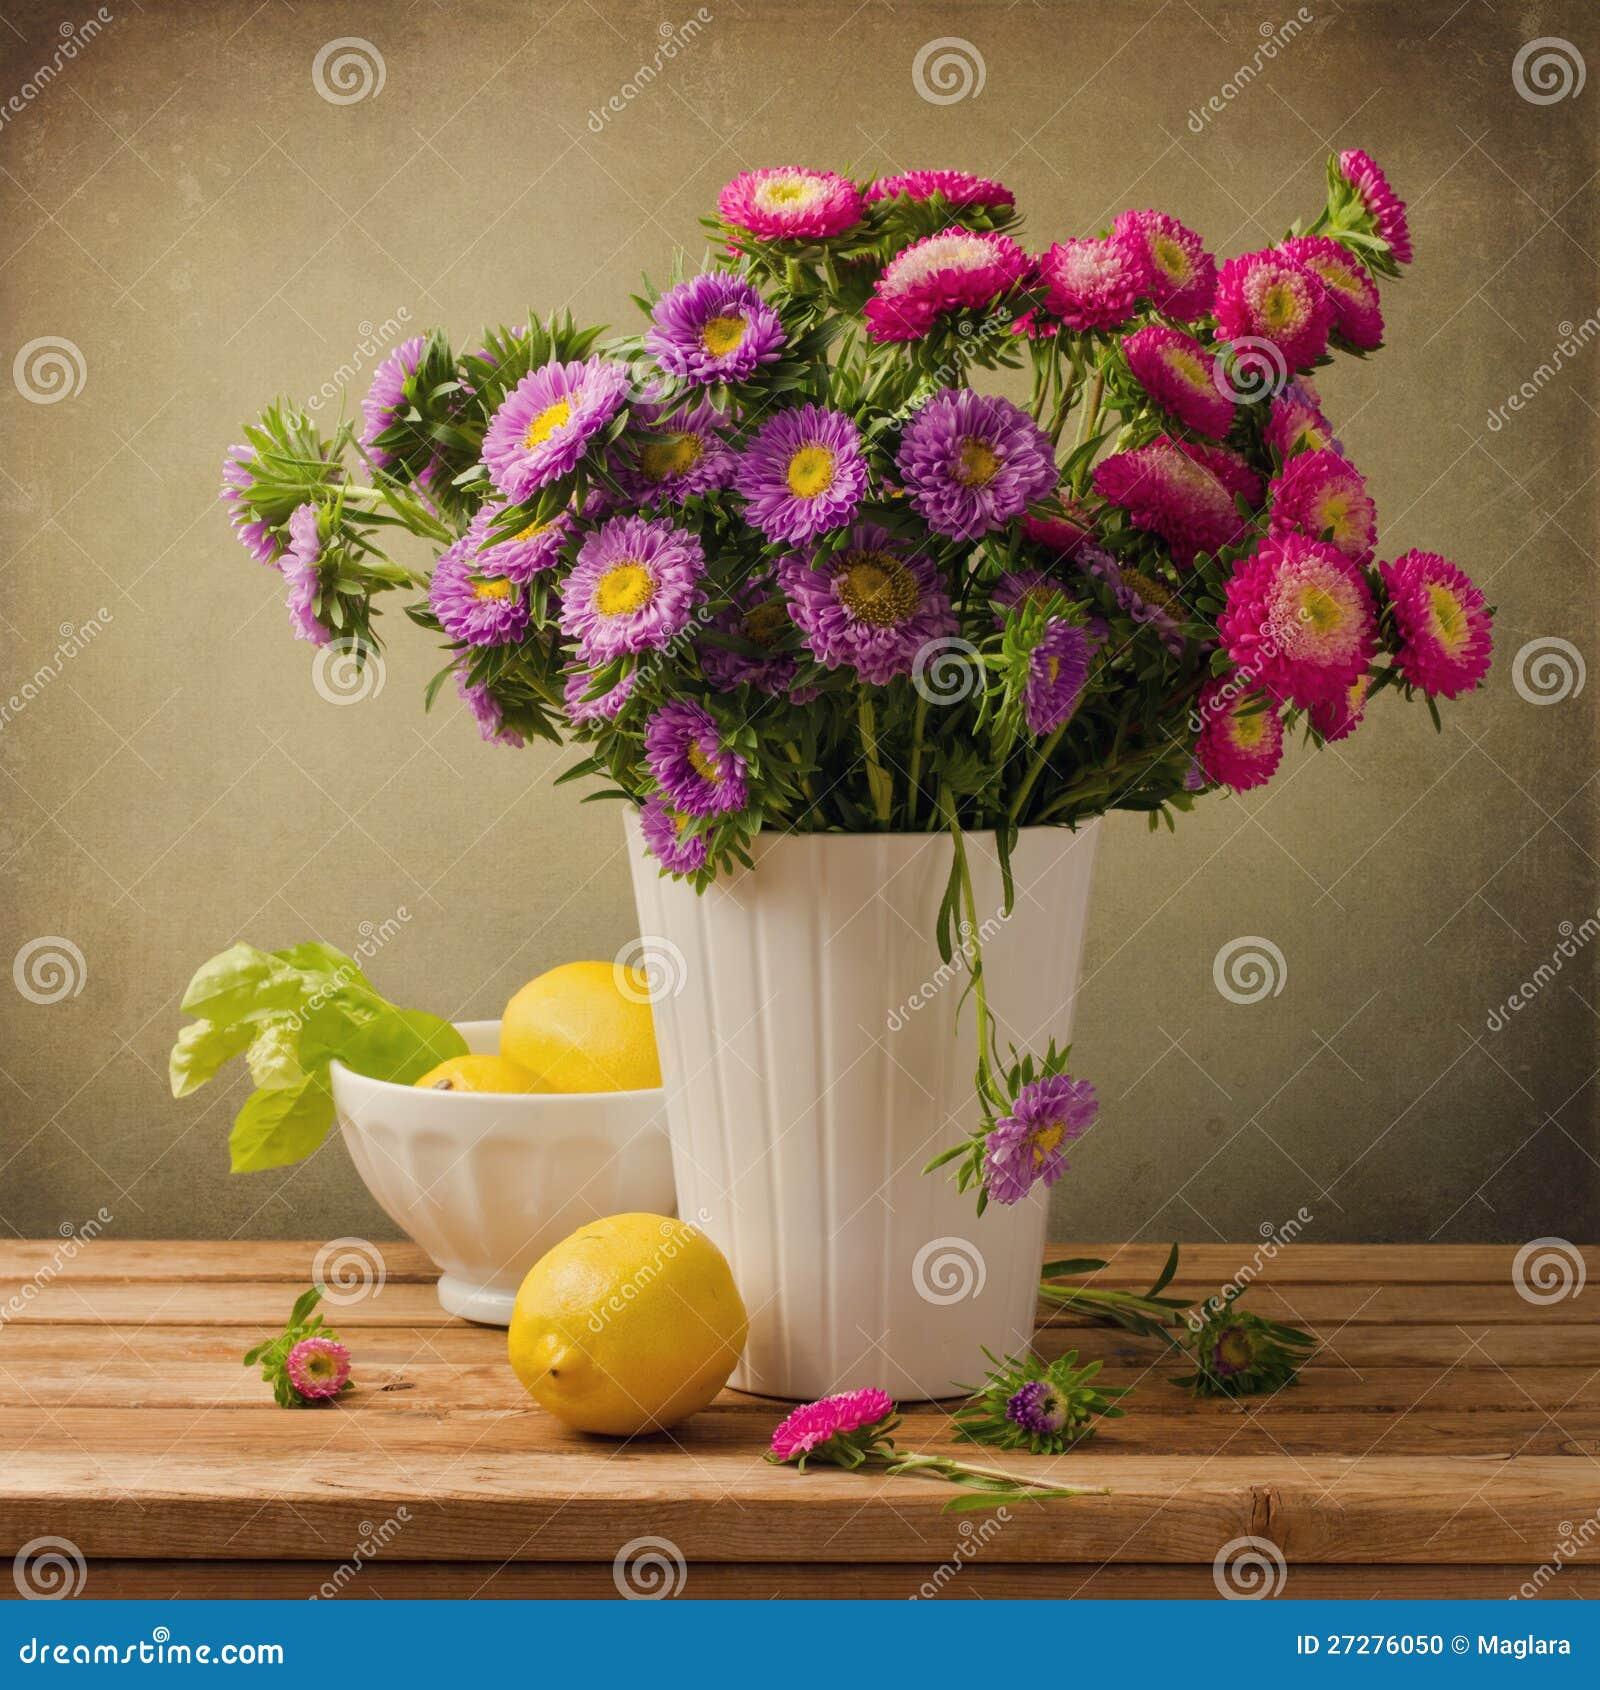 Beautiful aster flower bouquet stock photo image of composition download beautiful aster flower bouquet stock photo image of composition background 27276050 izmirmasajfo